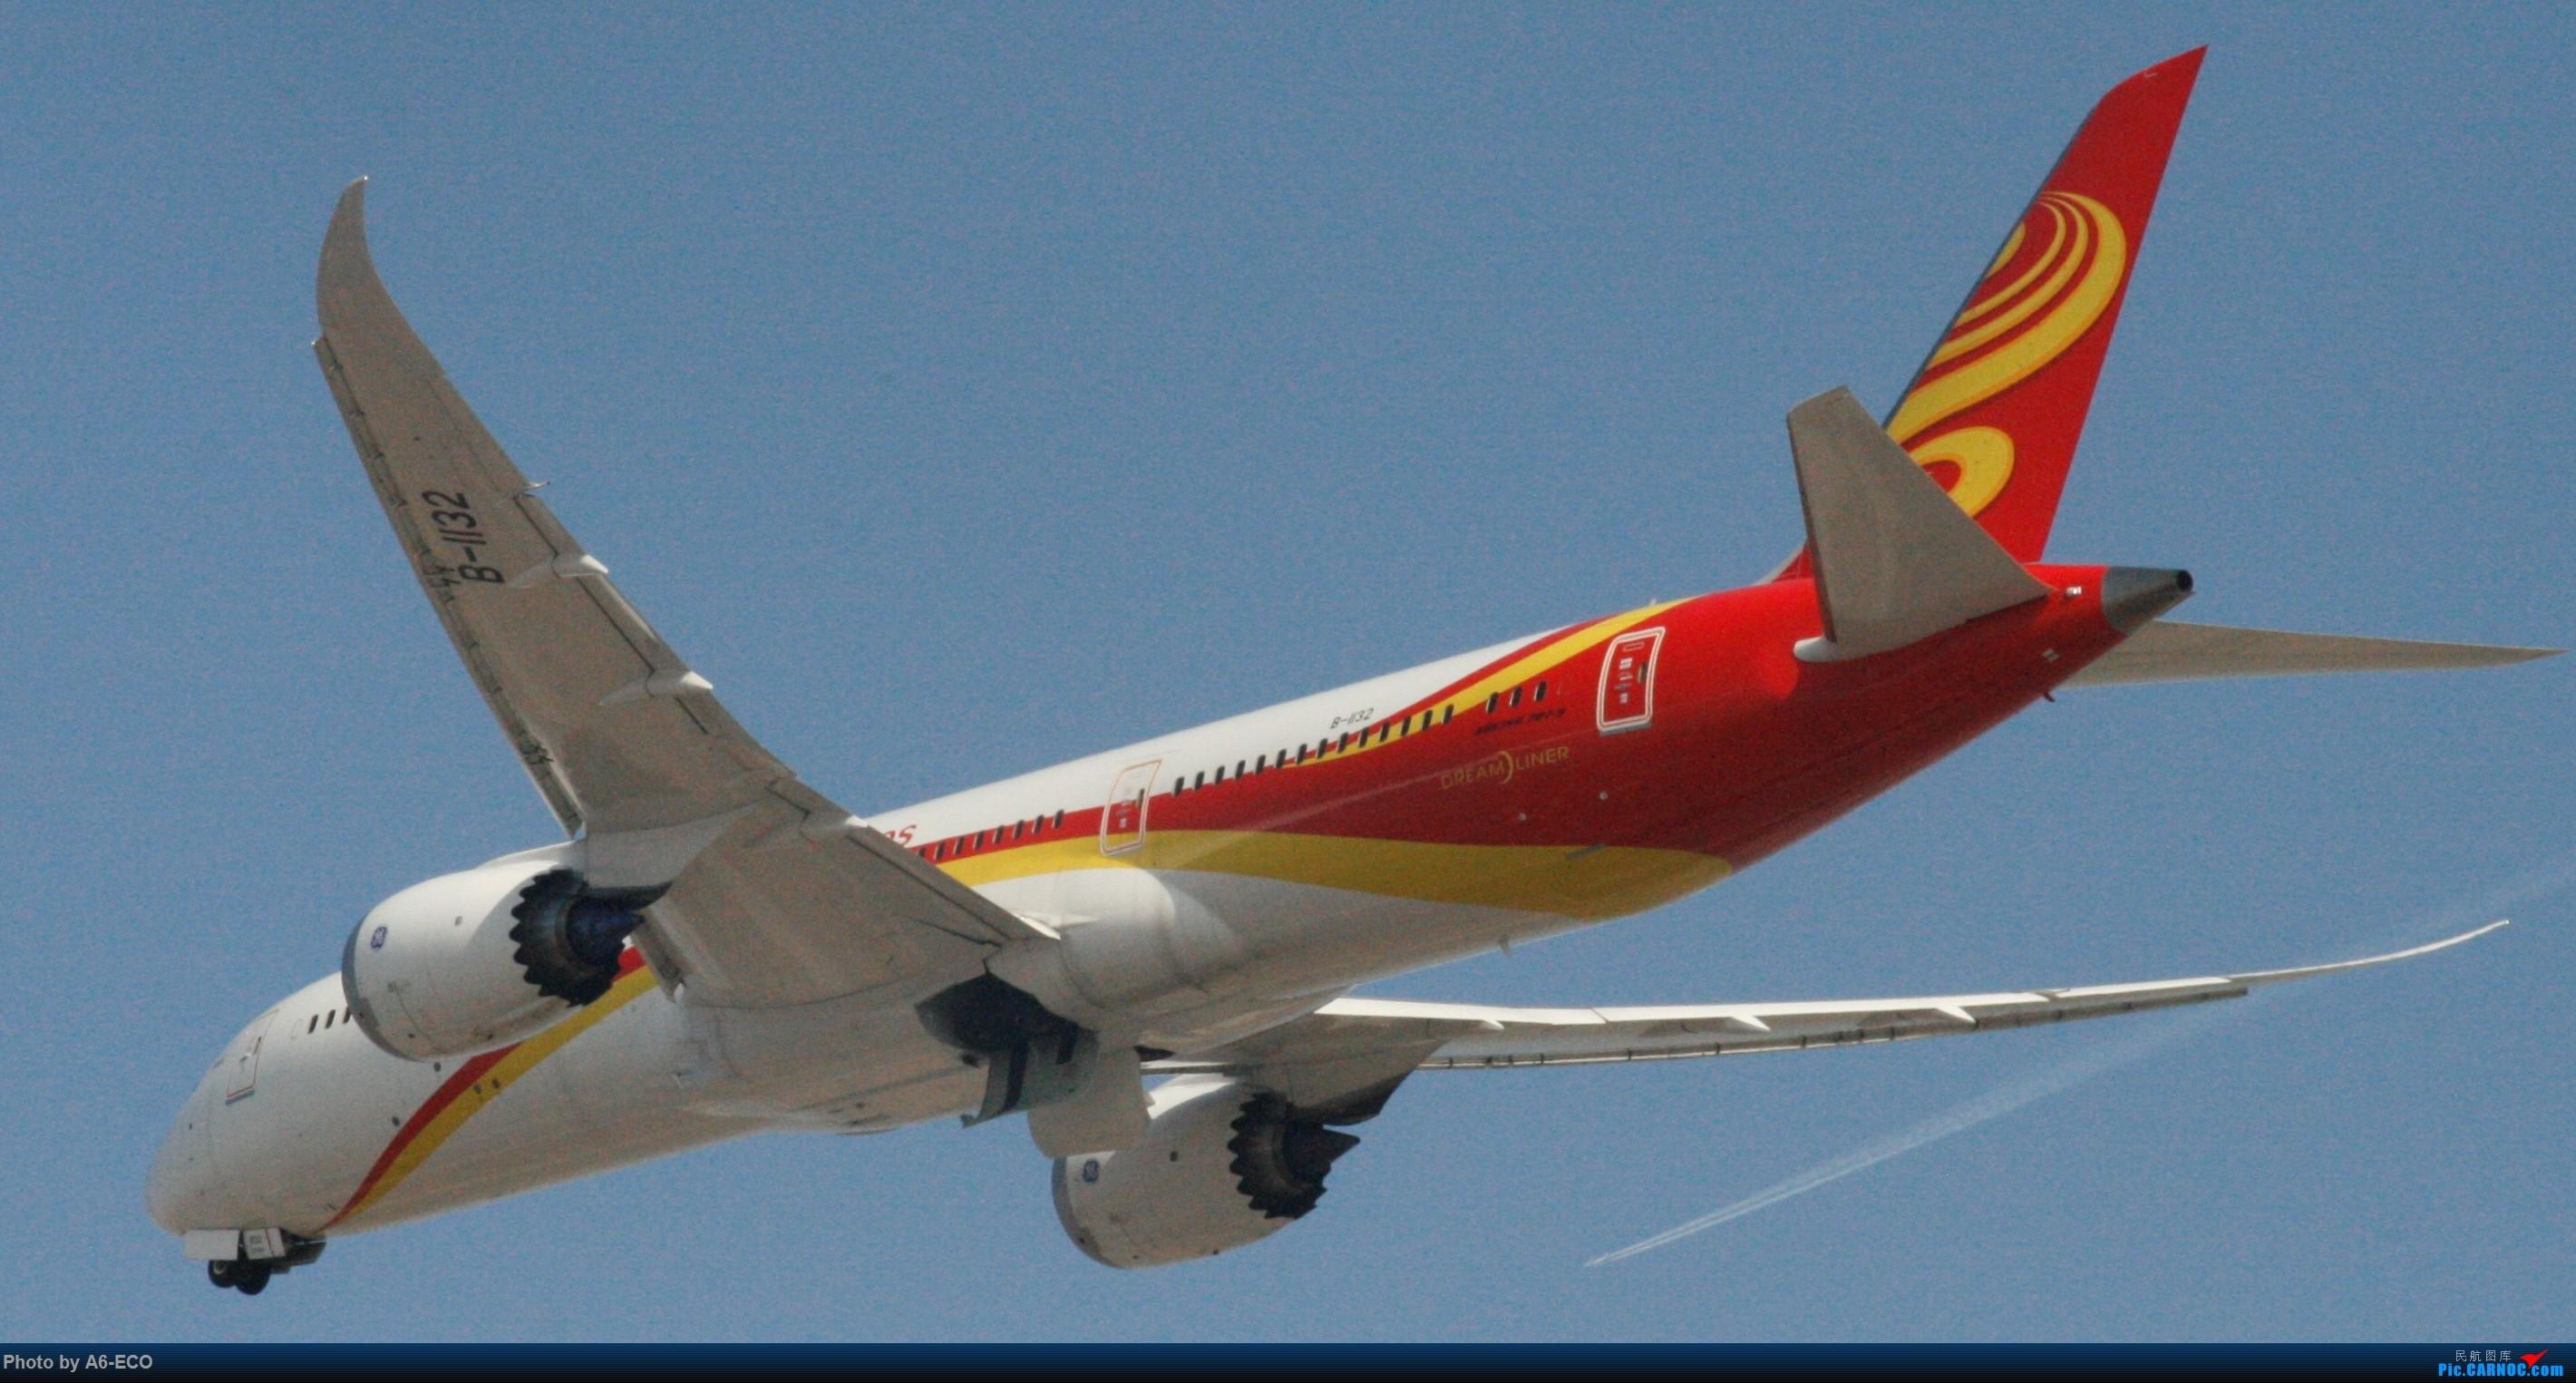 Re:[原创]今天运气极好,云南孔雀,B-1070,2个菜航邮戳,泡菜航彩绘,东航邮戳...... BOEING 787-9 B-1132 中国北京首都国际机场